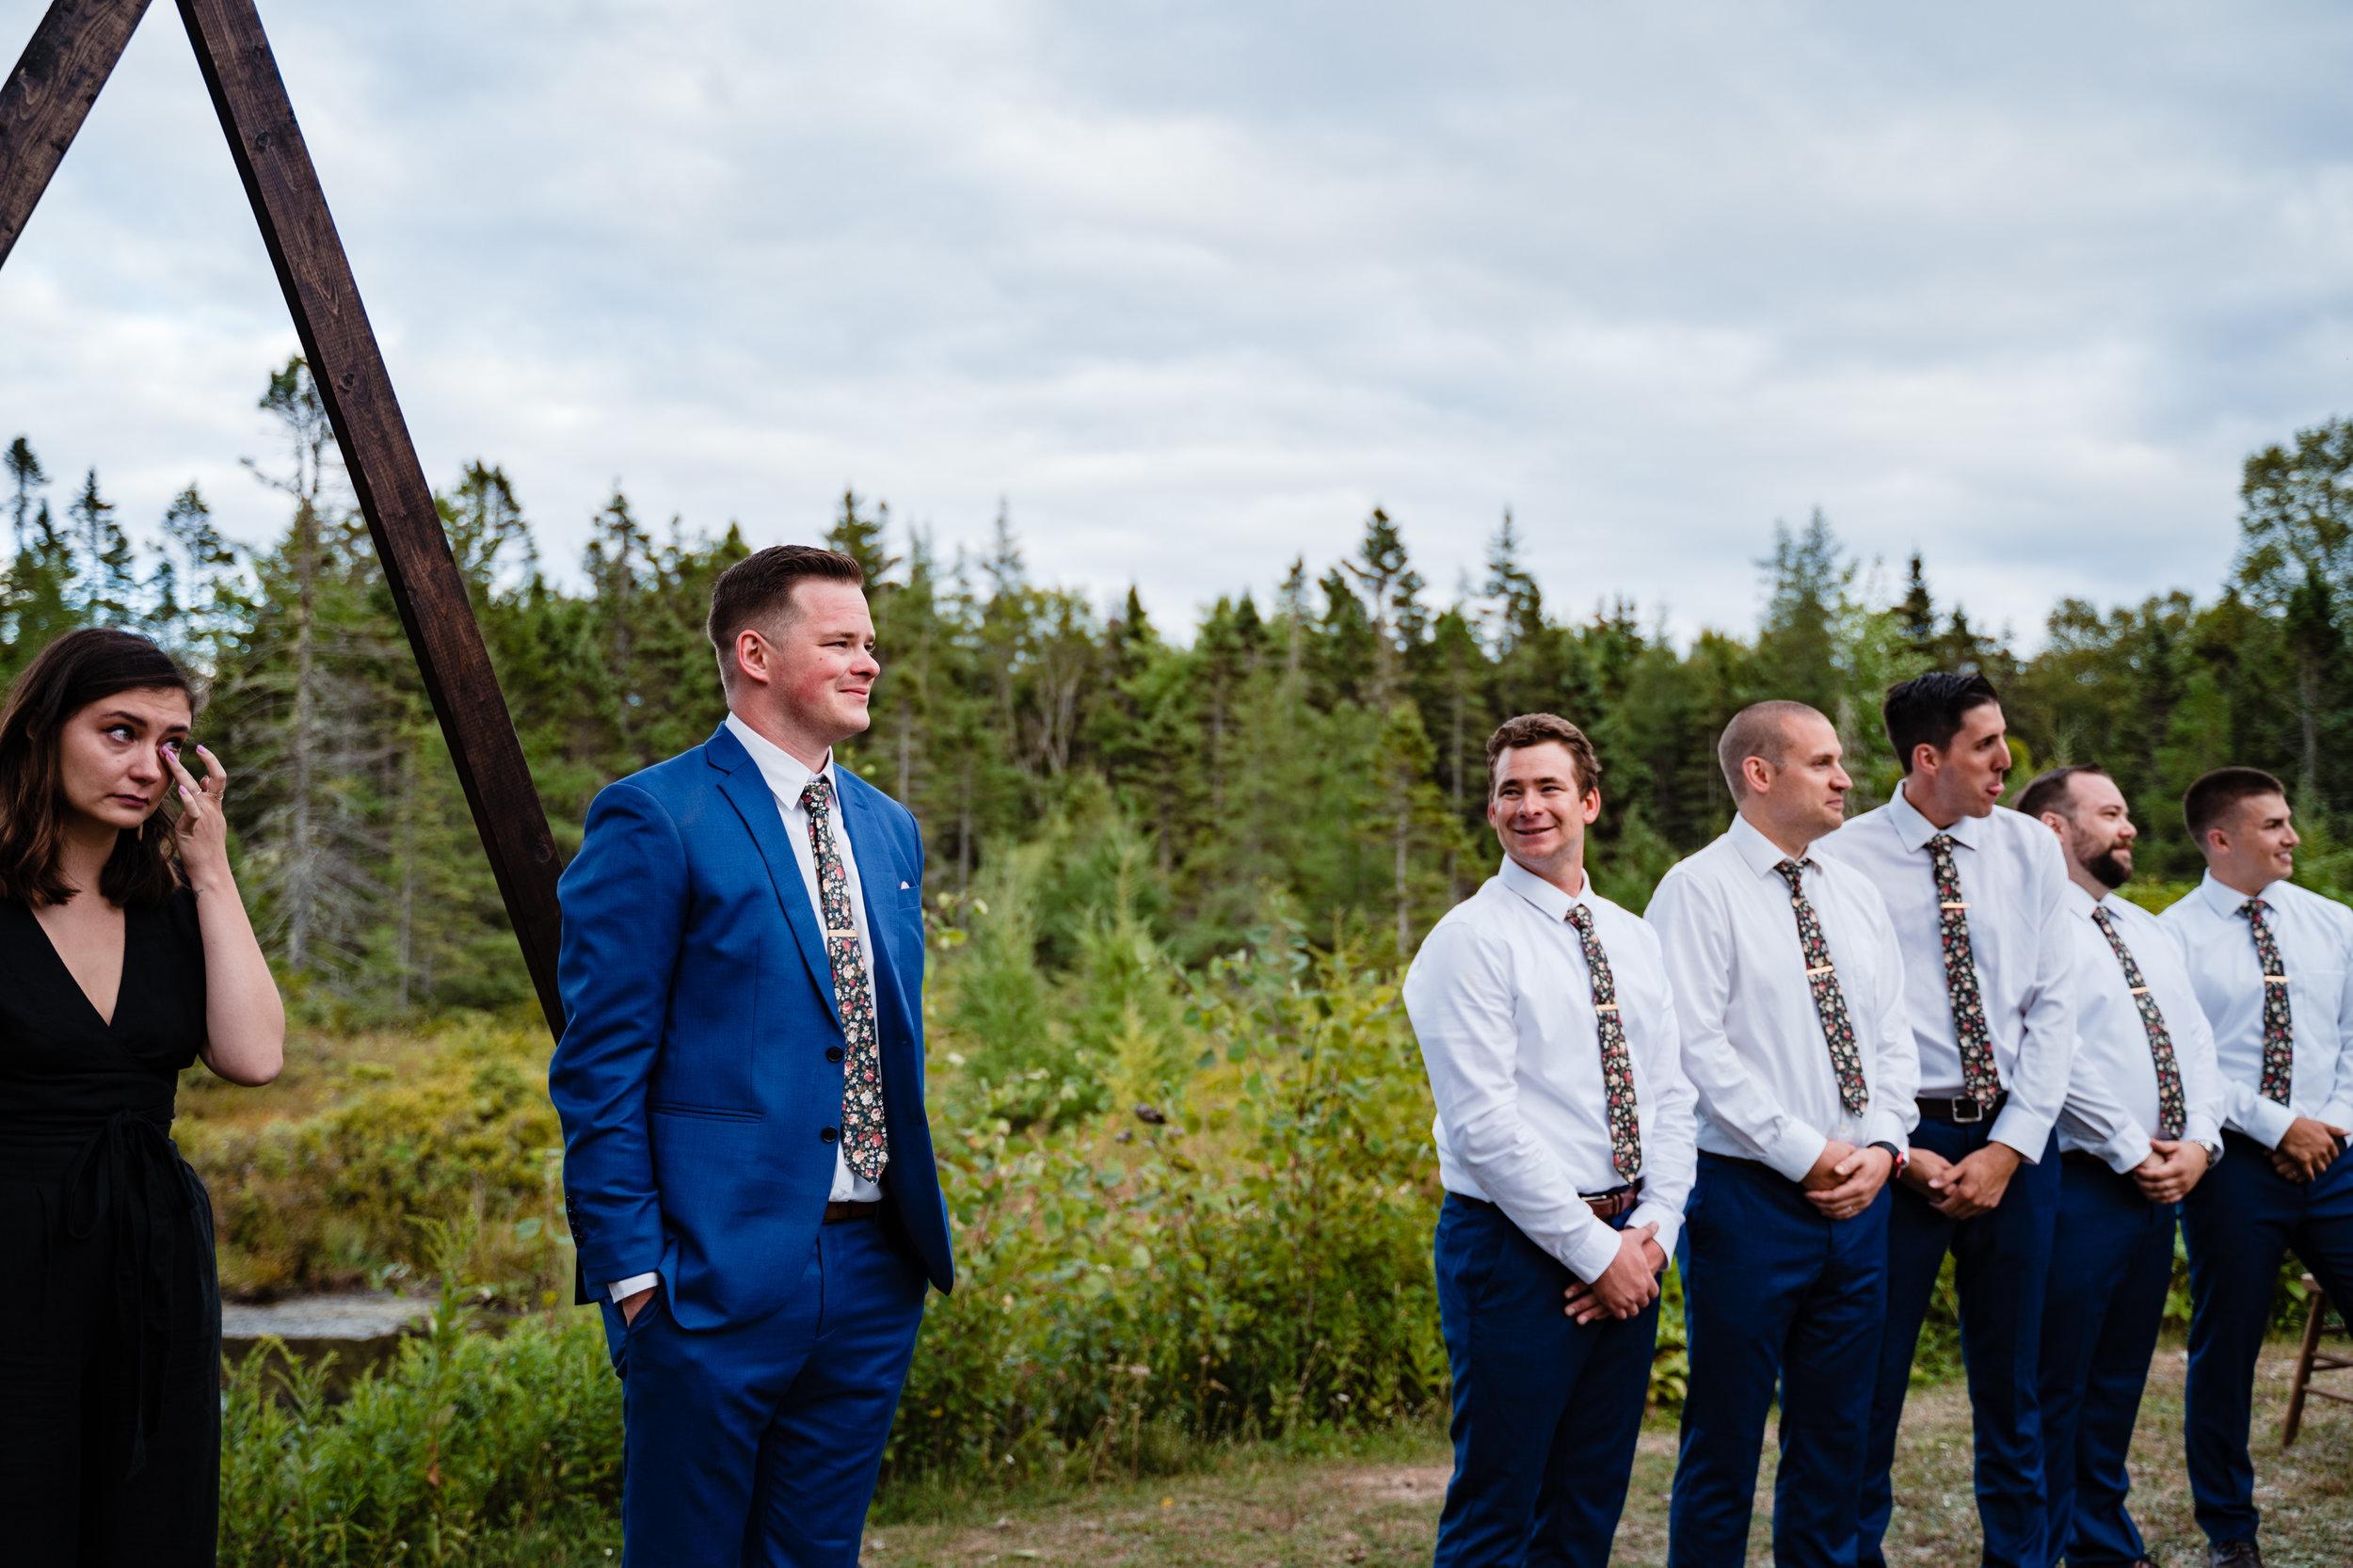 Janelle-Mitch-Halifax-Wedding-Nova-Scotia-Photography (102 of 163).jpg